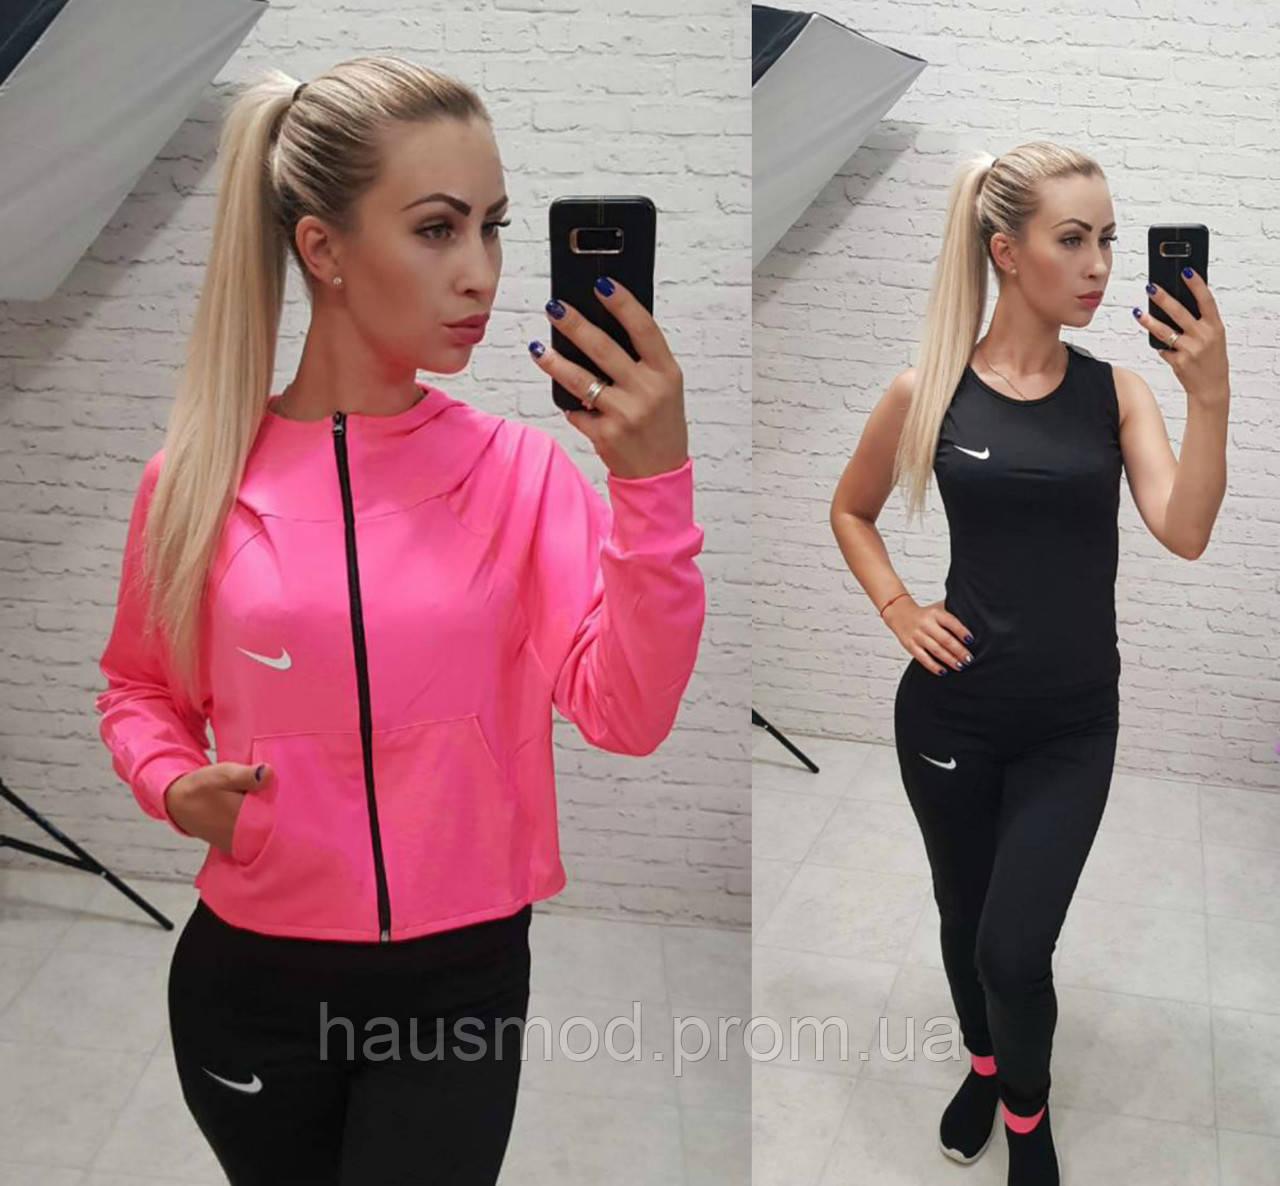 e4b056b2 Фитнес костюм 3-ка реплика Nike балахон с капюшоном майка и лосины микро  дайвинг розовый